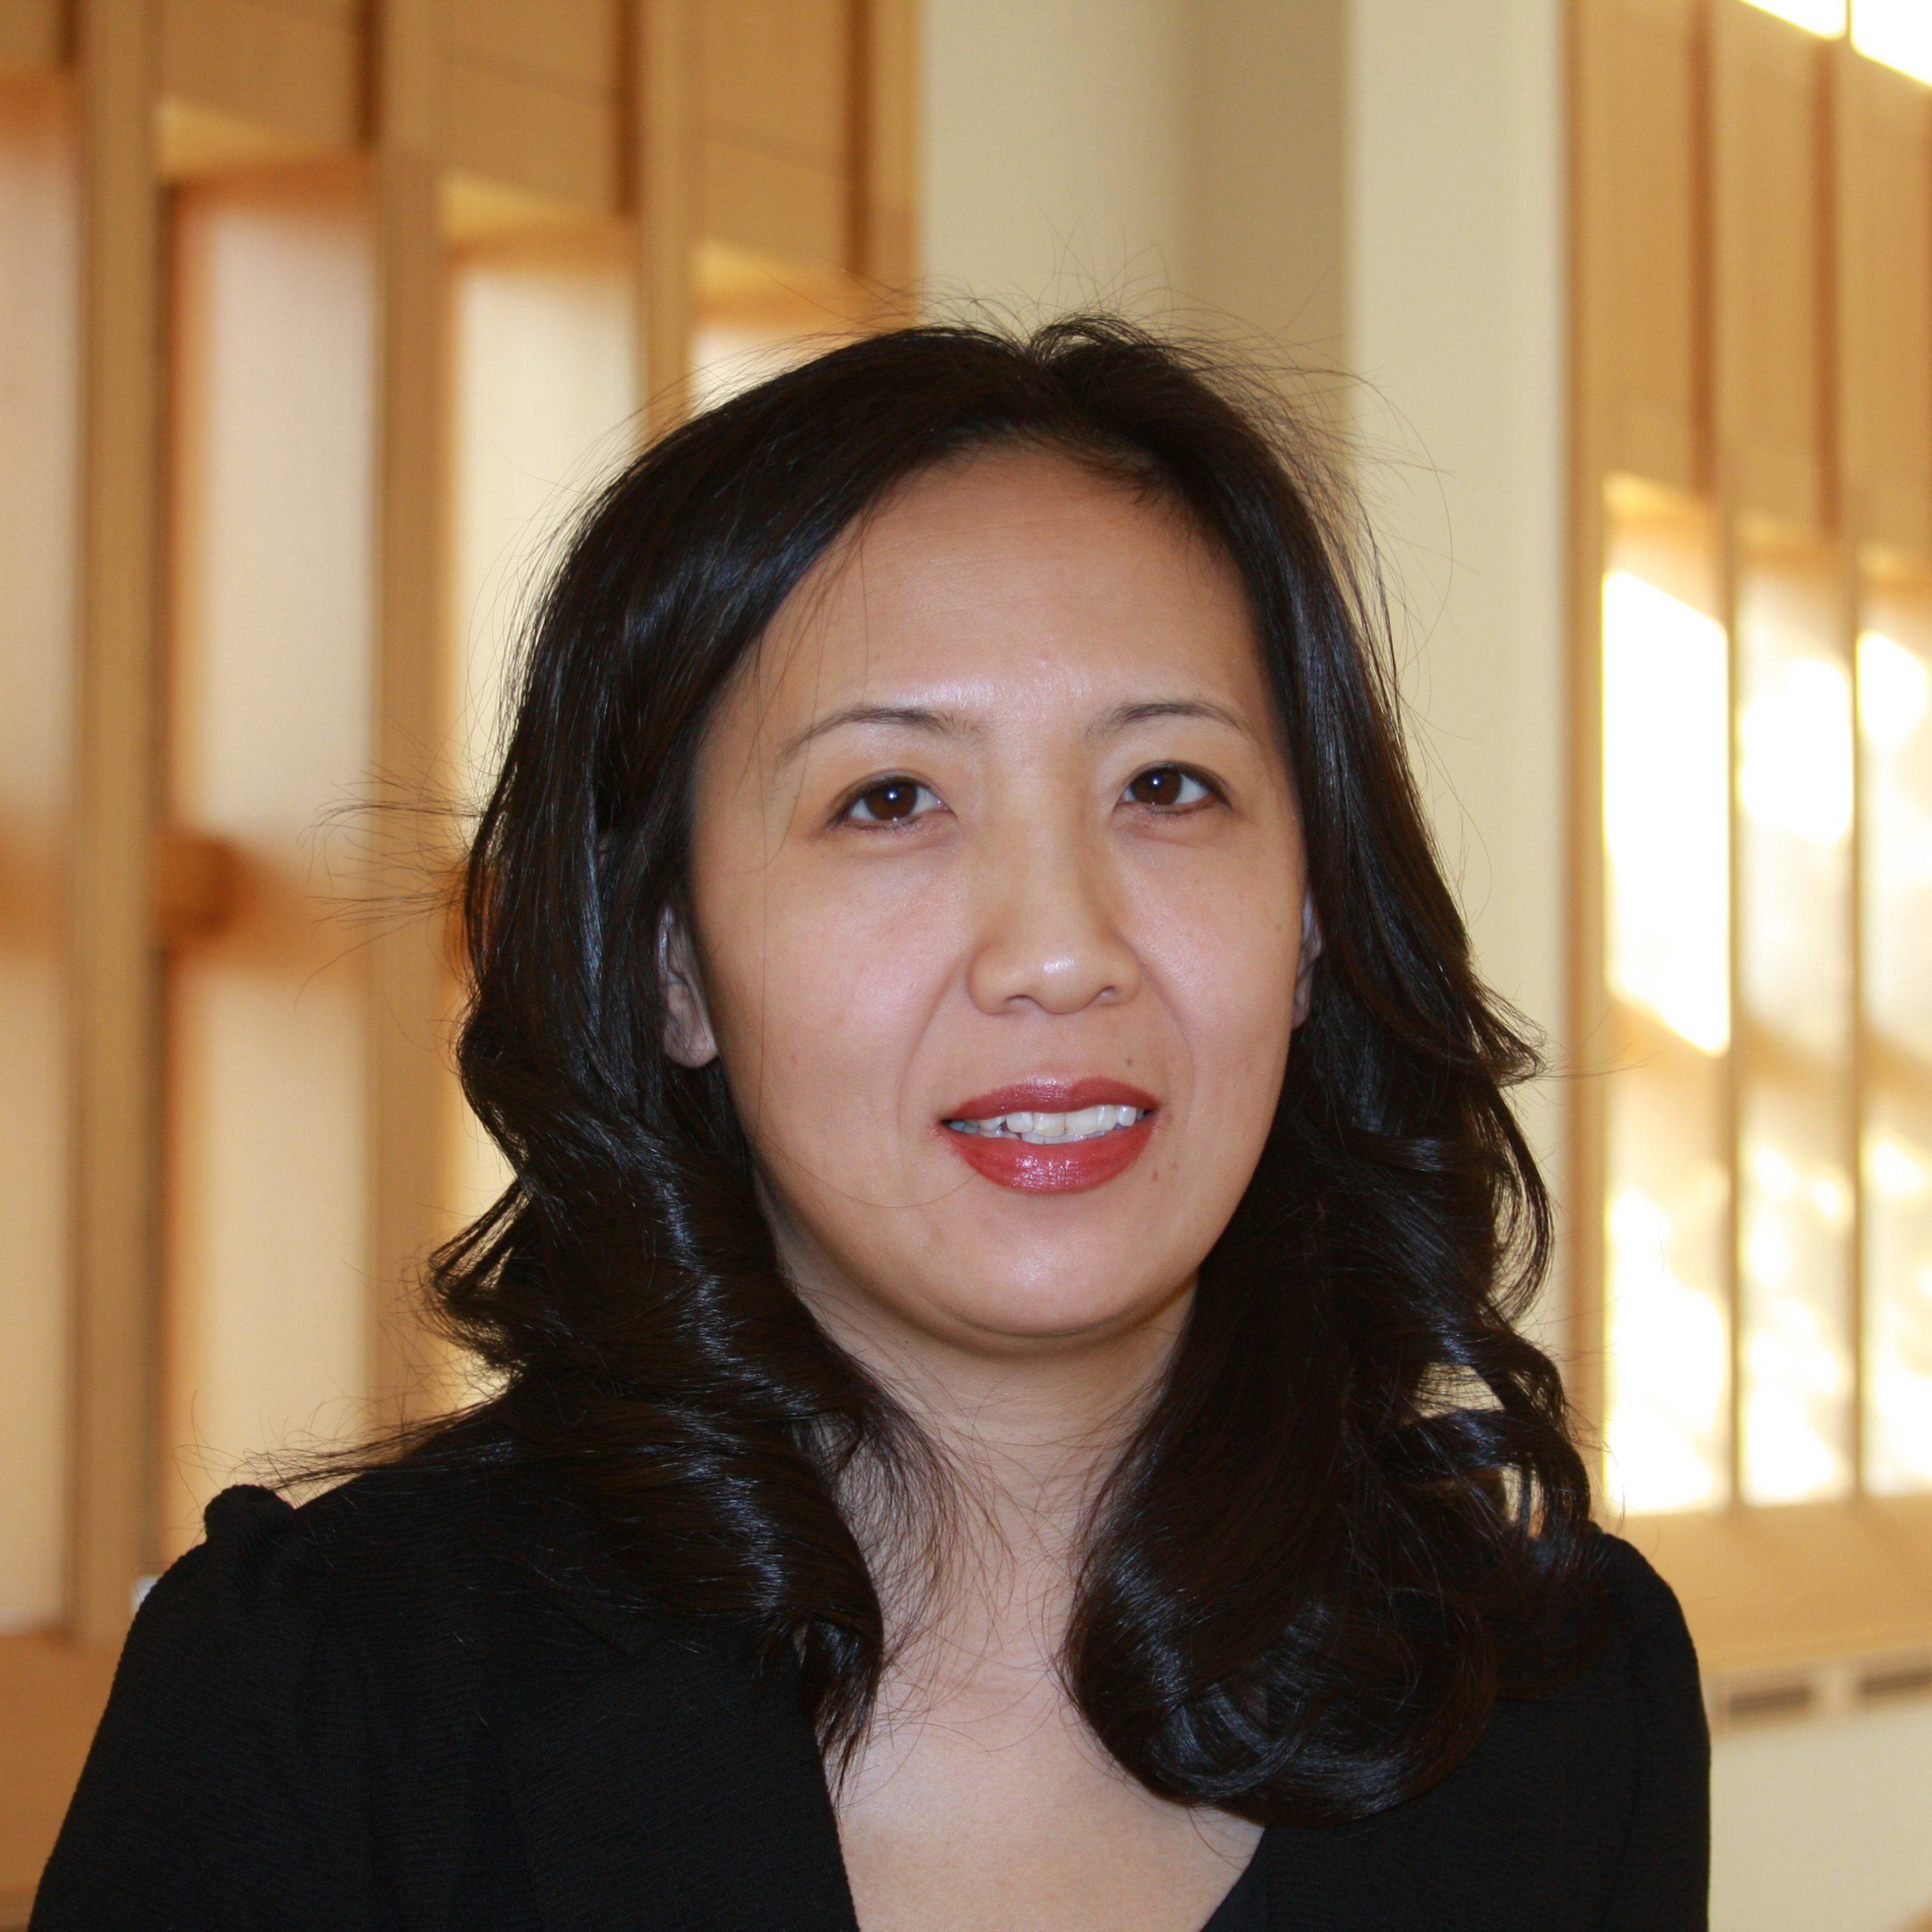 Huyen (Gwen) Nguyen